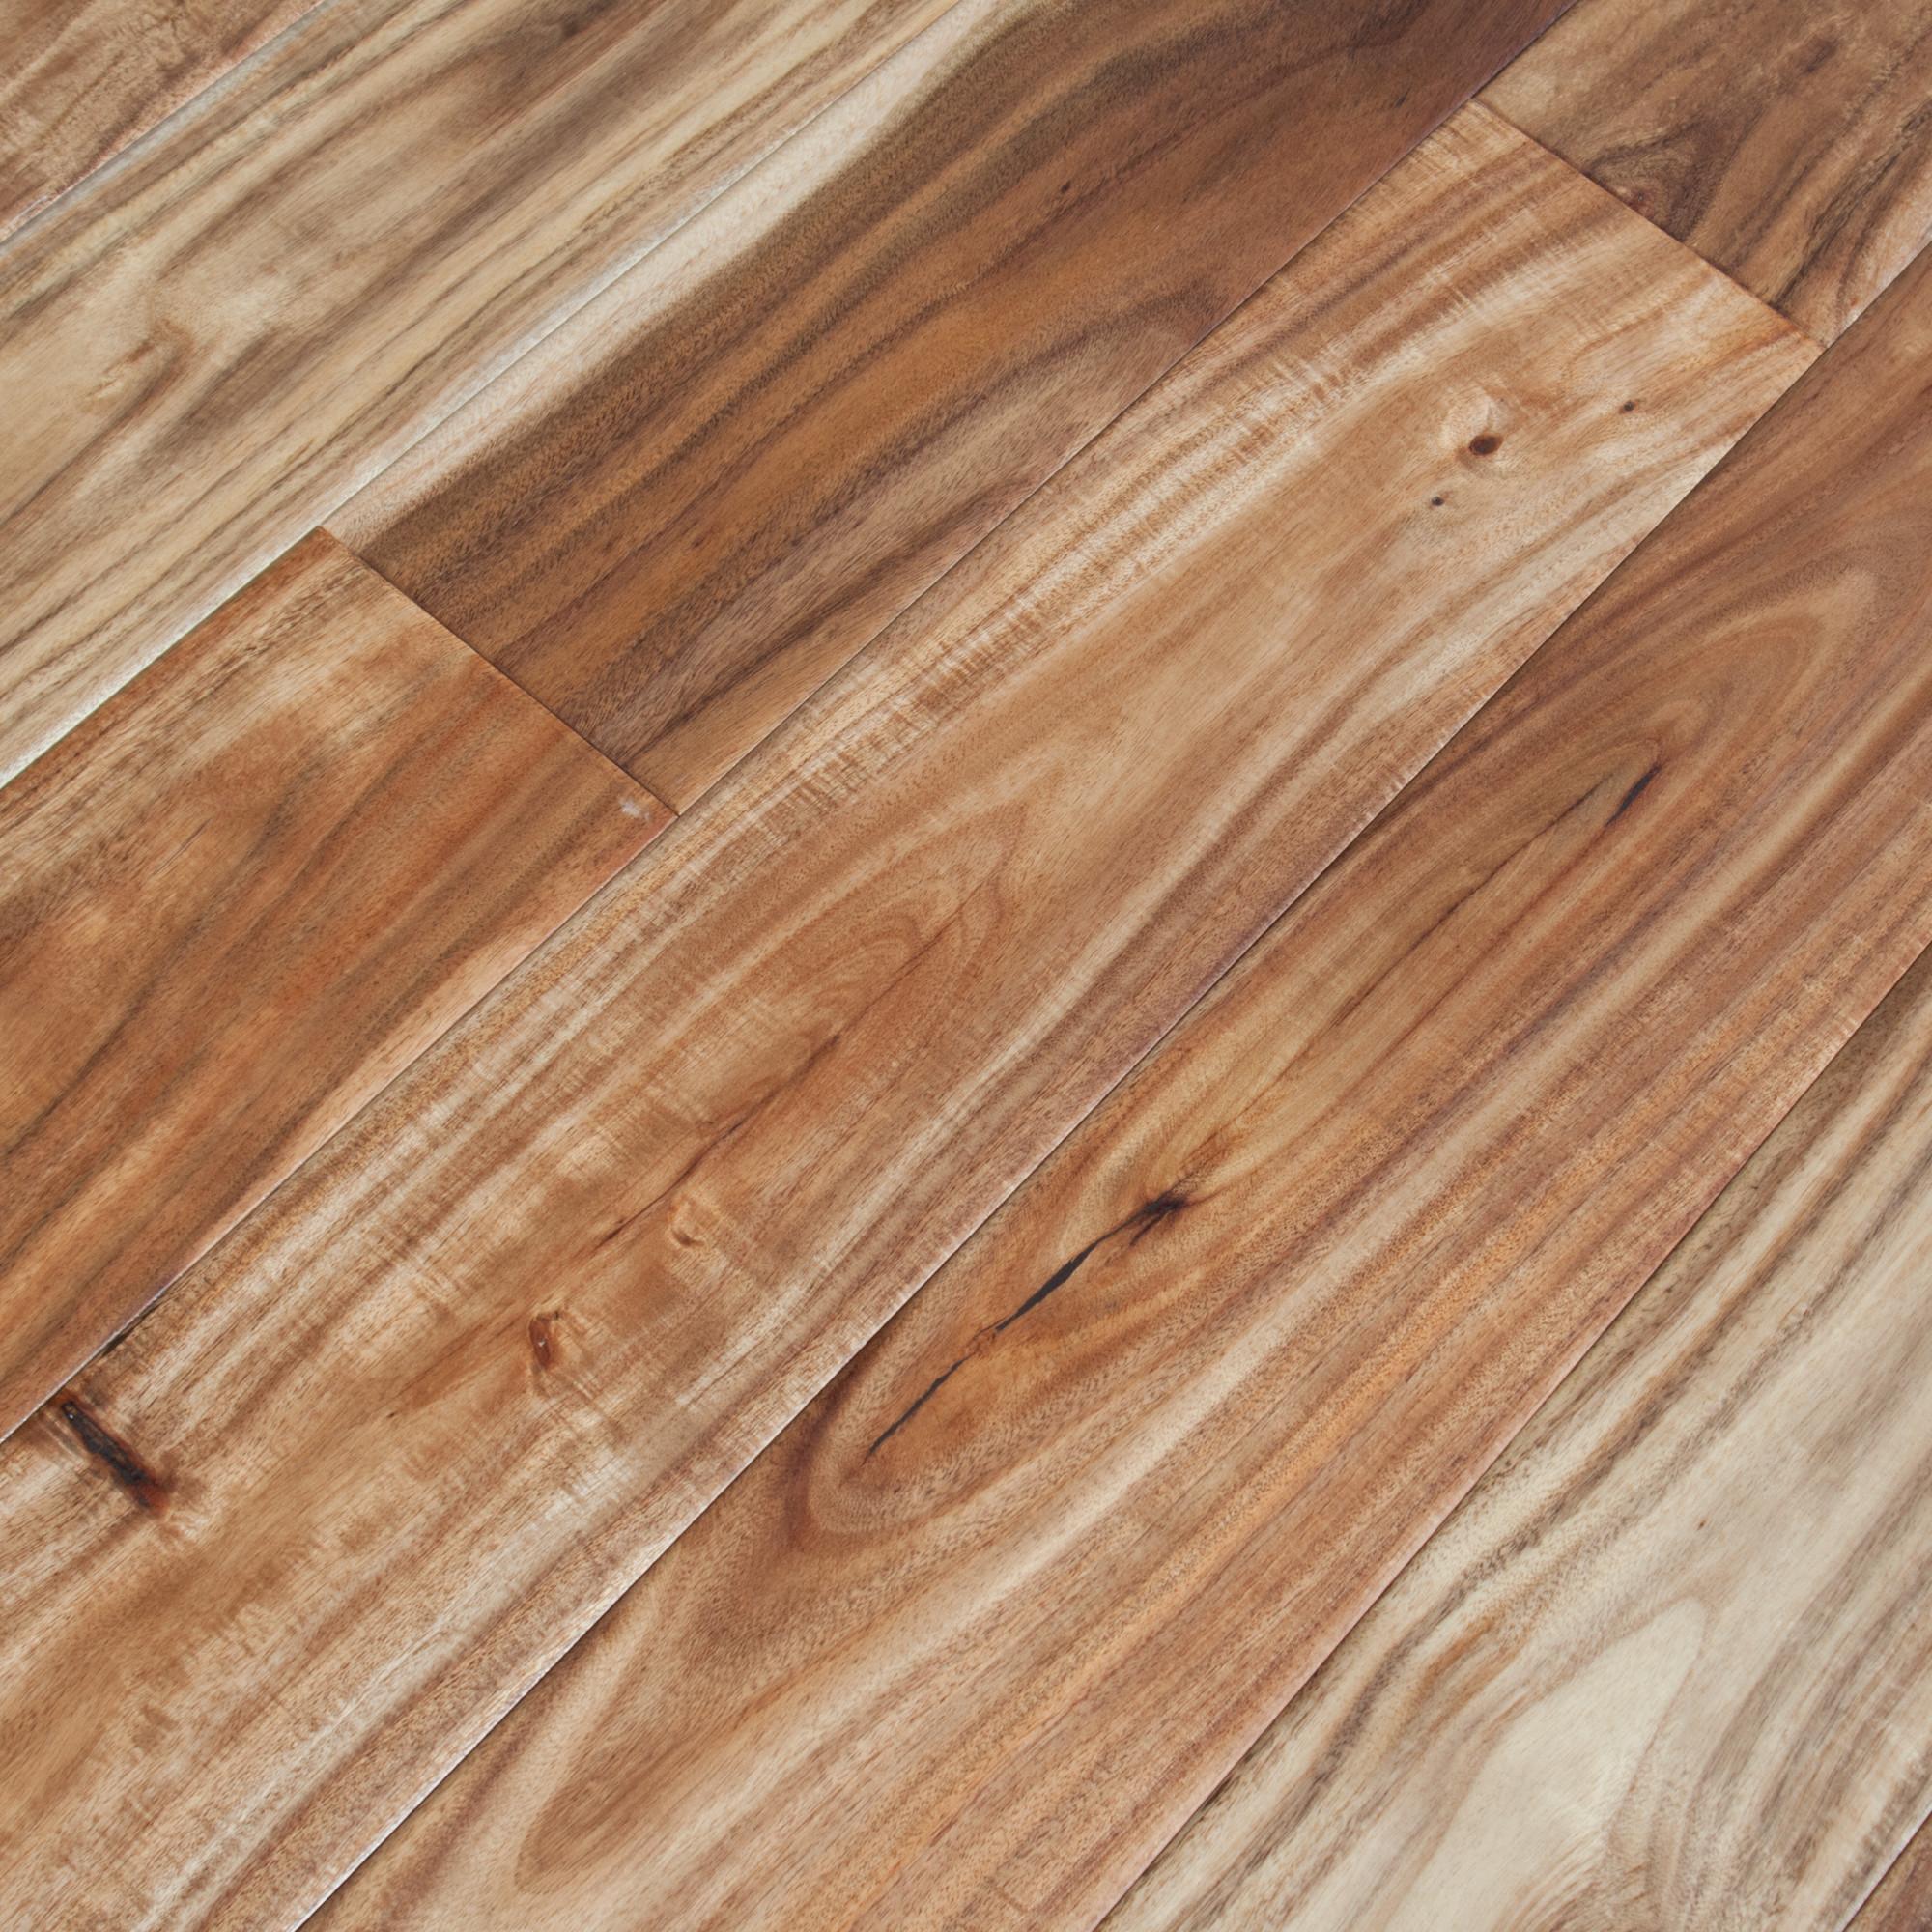 tools needed to install floating hardwood floor of 9 mile creek acacia hand scraped acacia confusa wood floors with acacia handscraped natural hardwood flooring